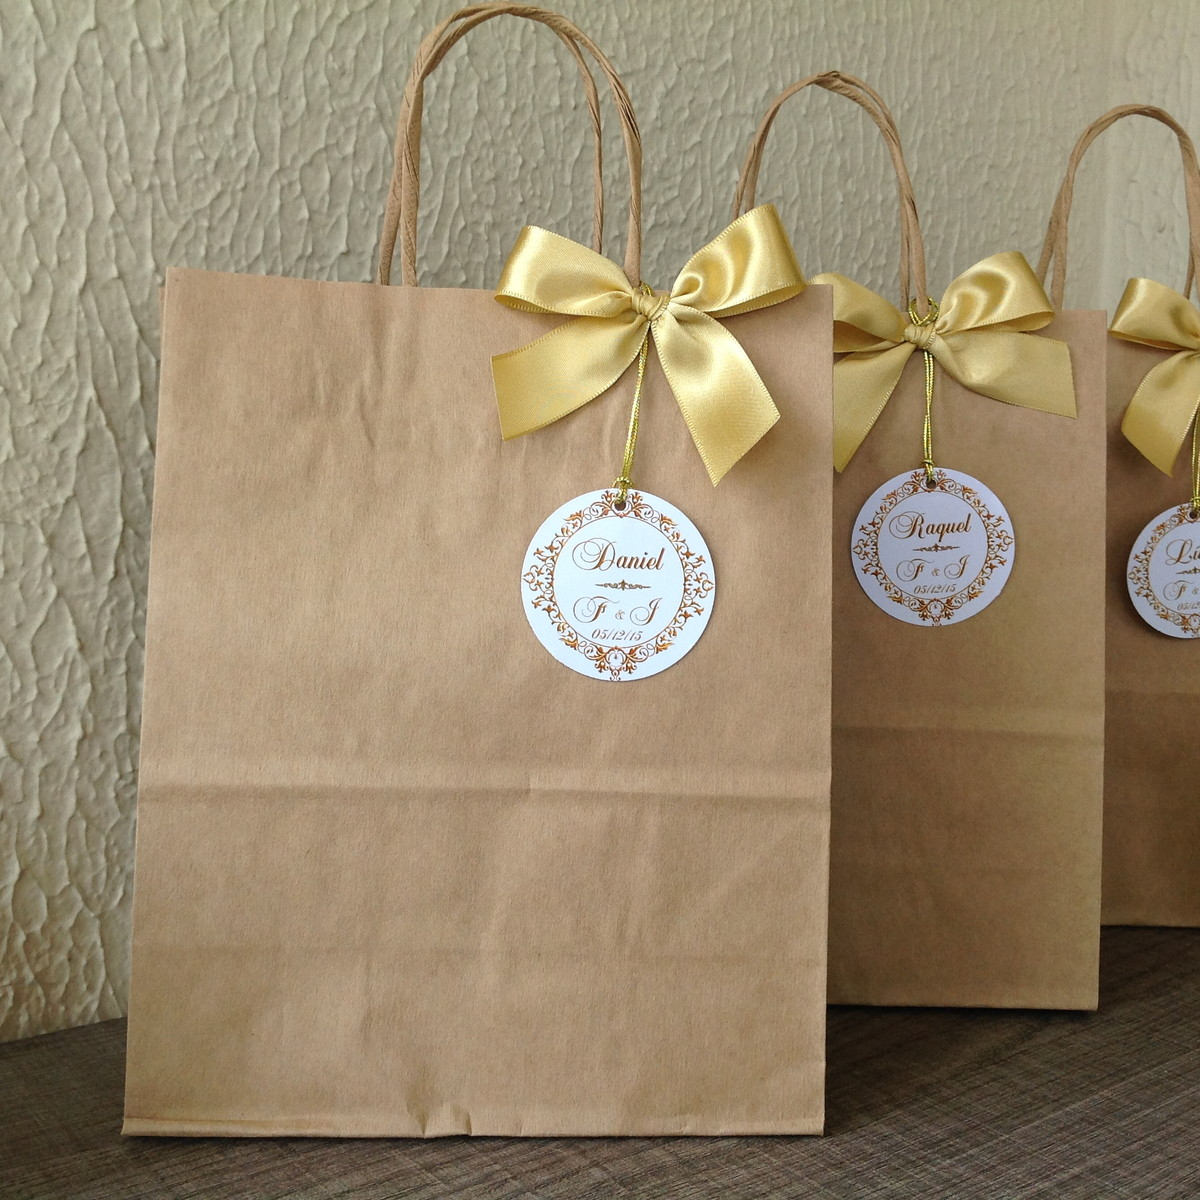 Bolsa De Papel Personalizada Casamento : Sacolas personalizadas casamento no elo mimos